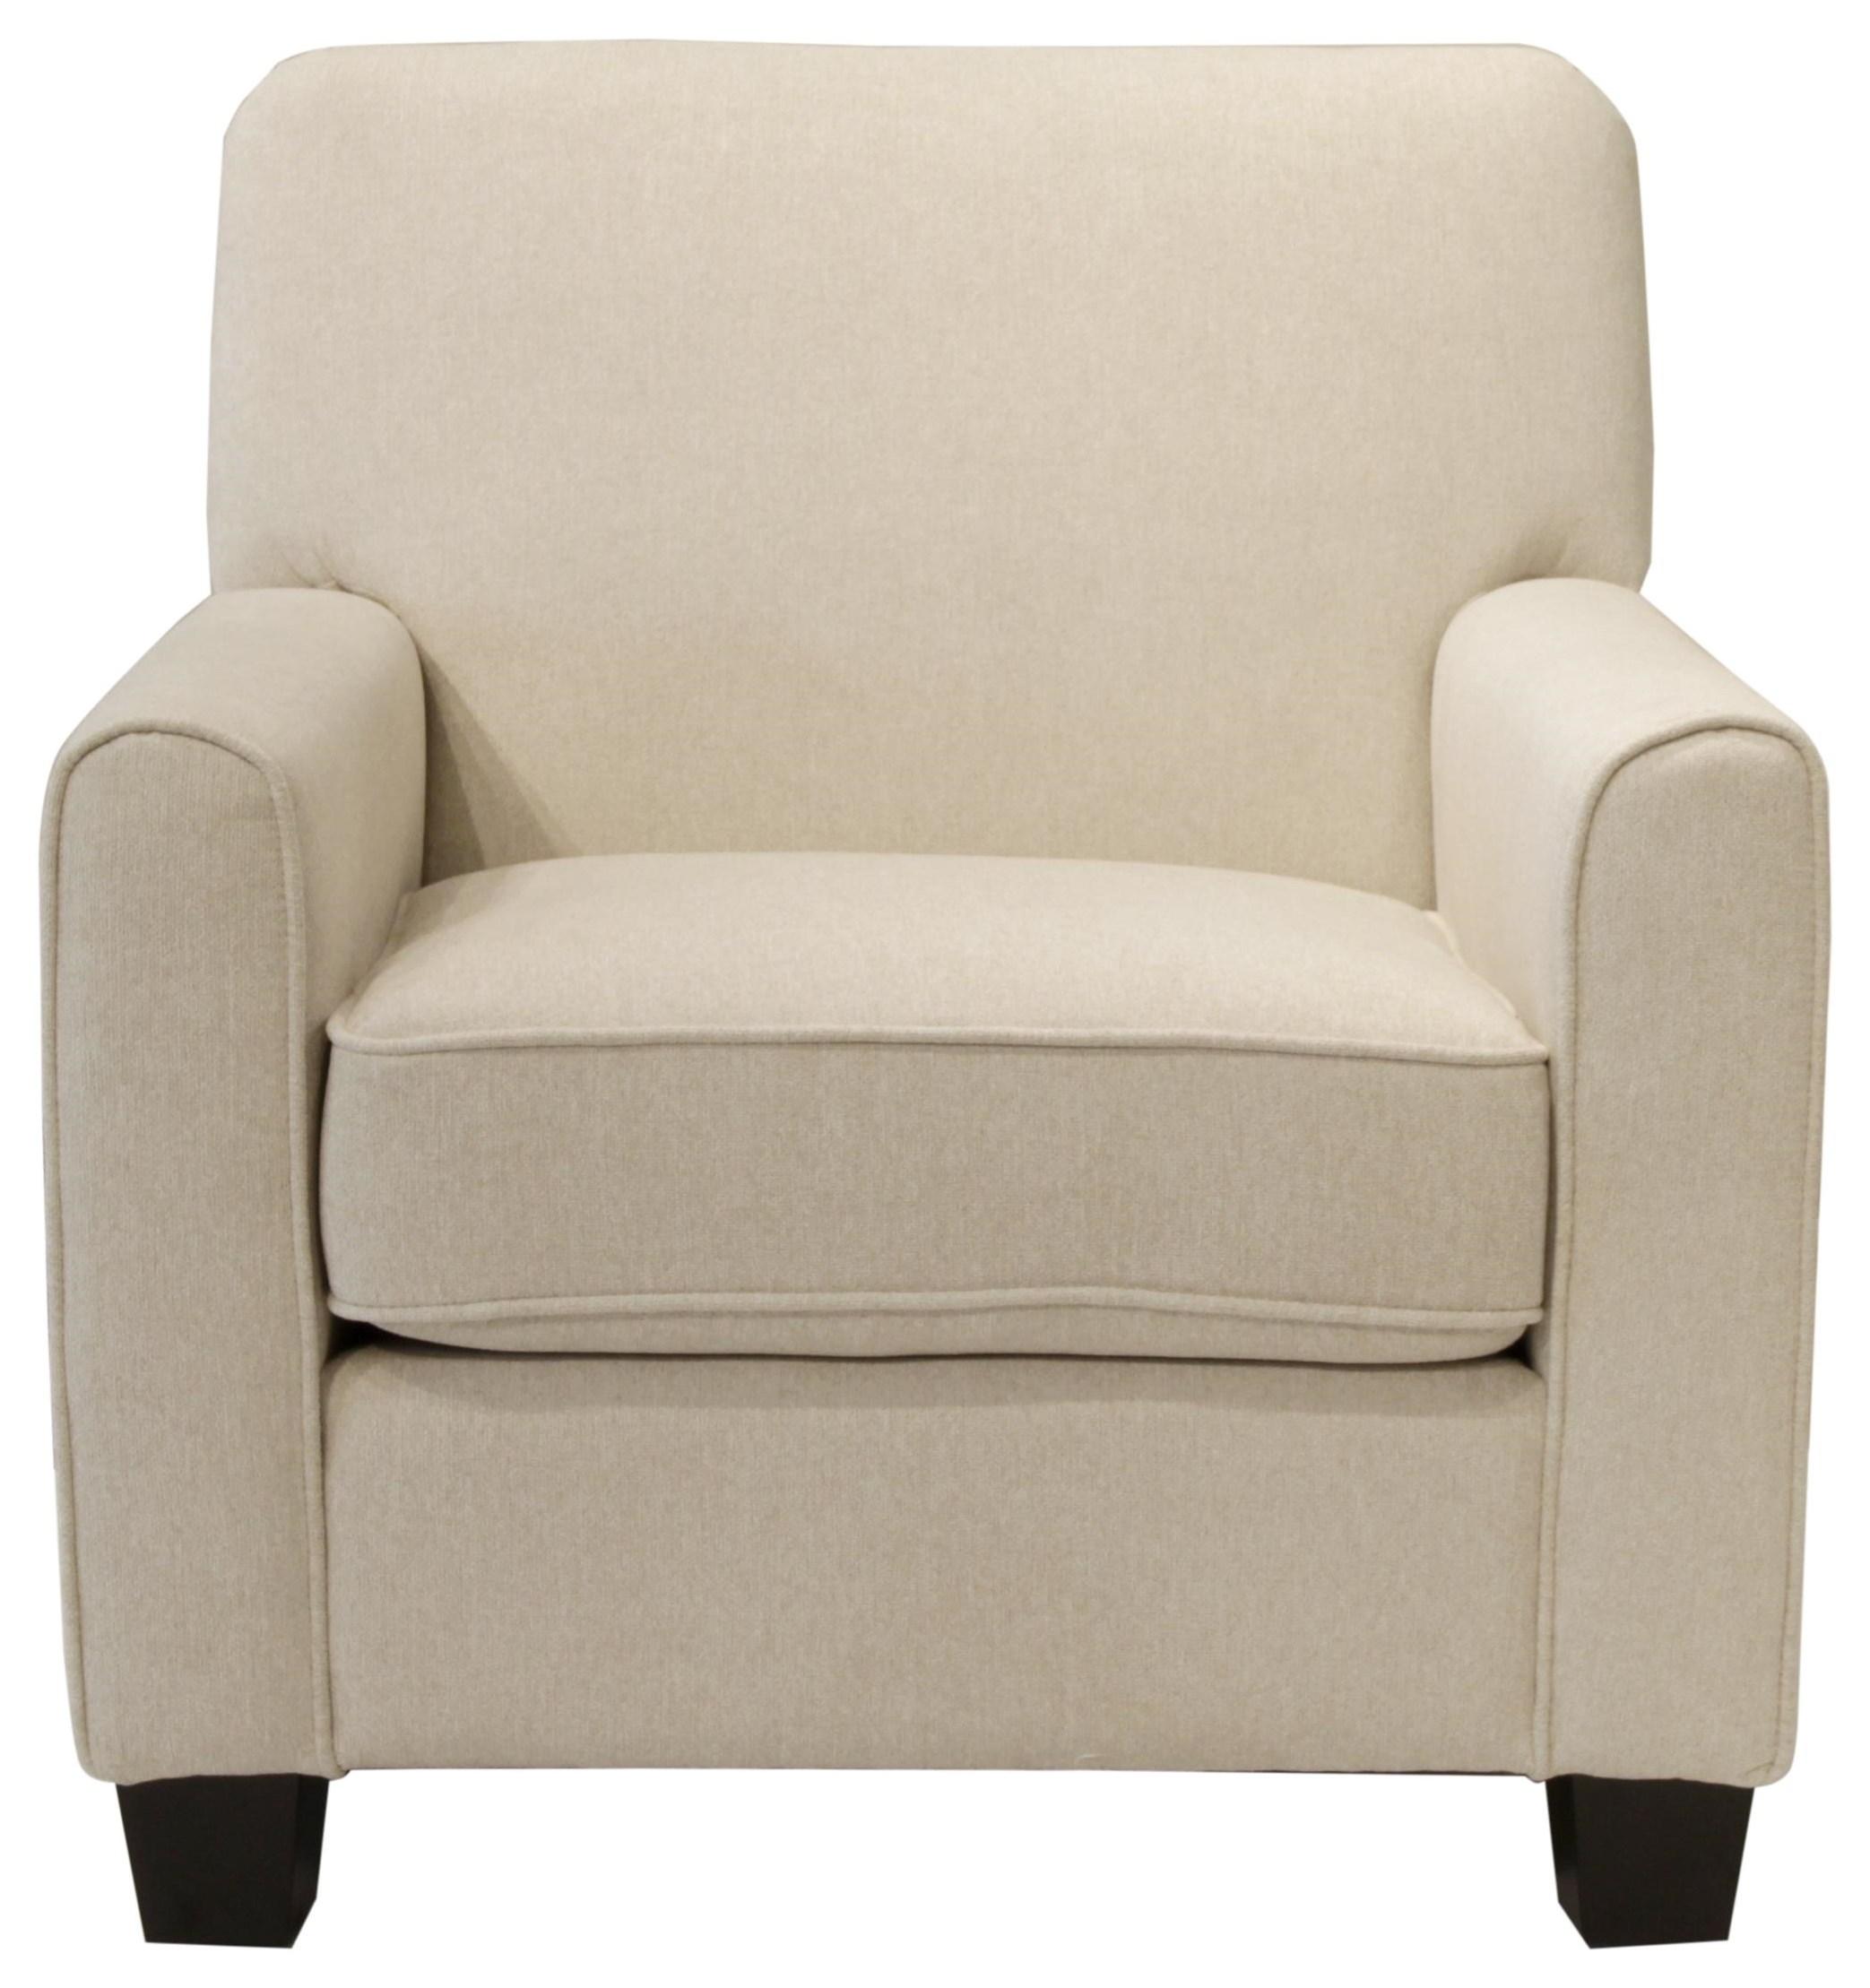 Dele Ltd. Imports, LLC Paige Chair - Item Number: FG1951-2020